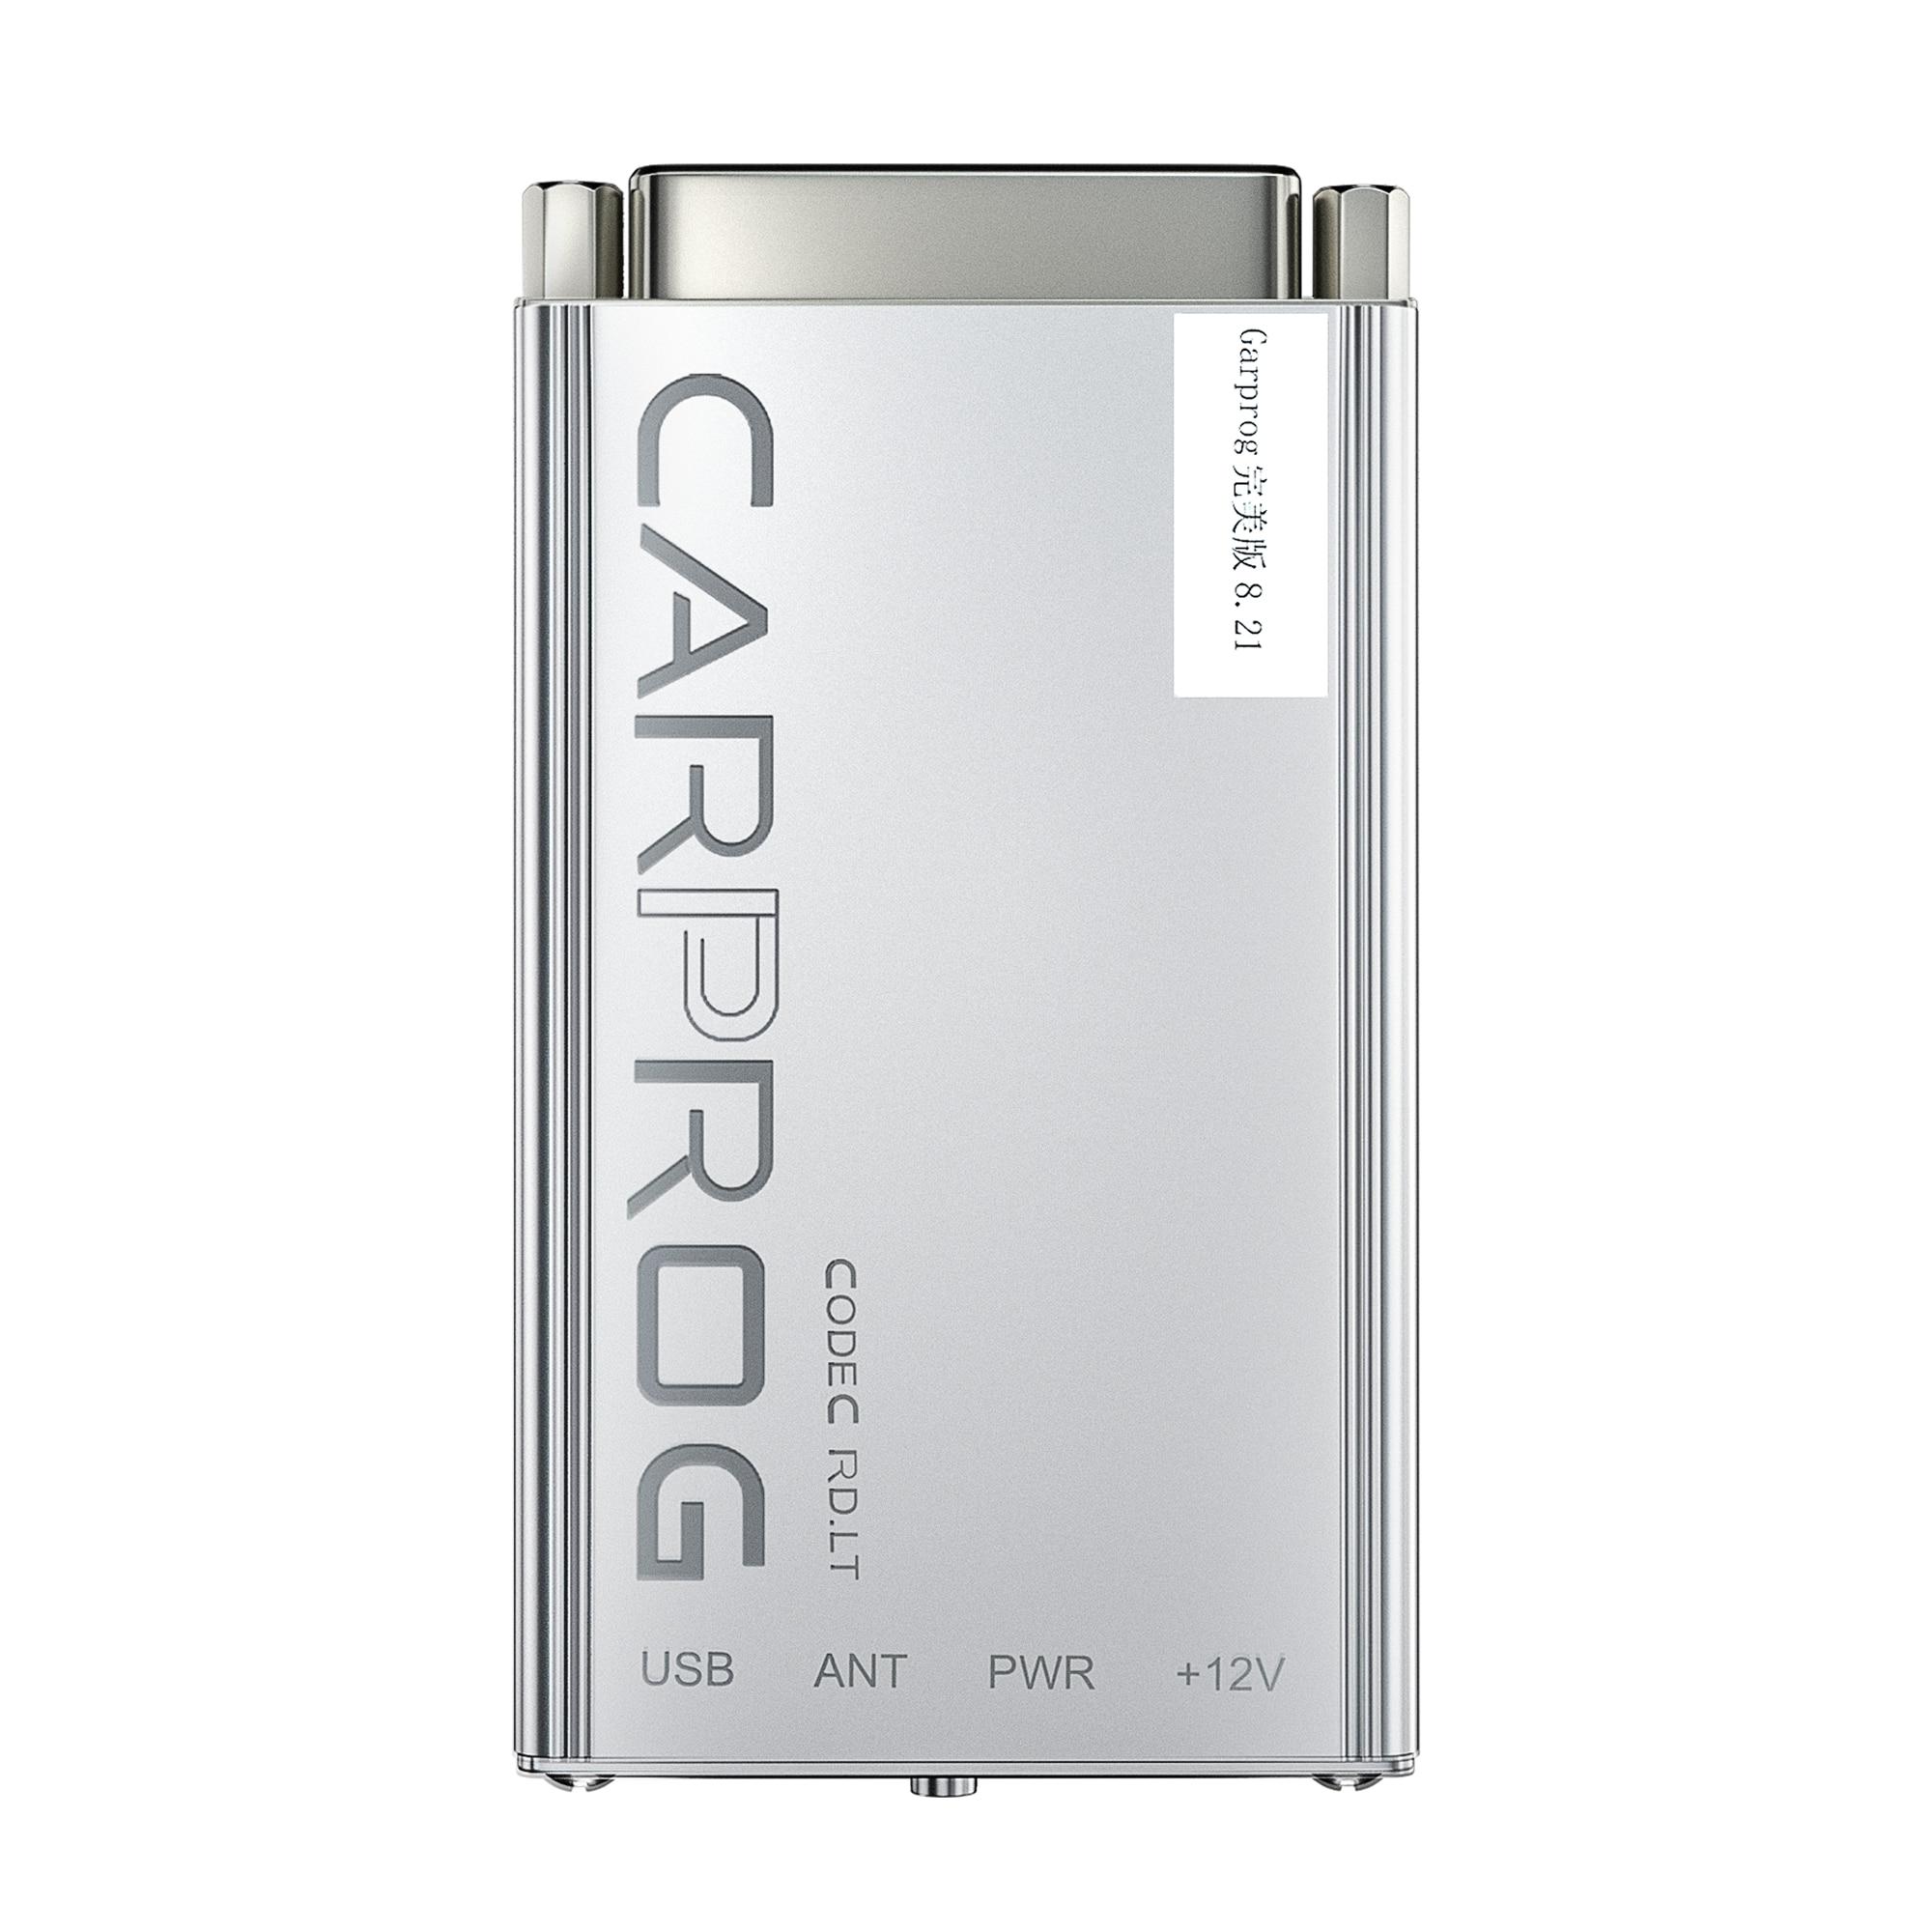 Carprog V8.21/10.05 car prog A1 ケーブルメインケーブルcarprogプログラマOBD2 スキャナエアバッグecuのプログラマー車diagnoticツール